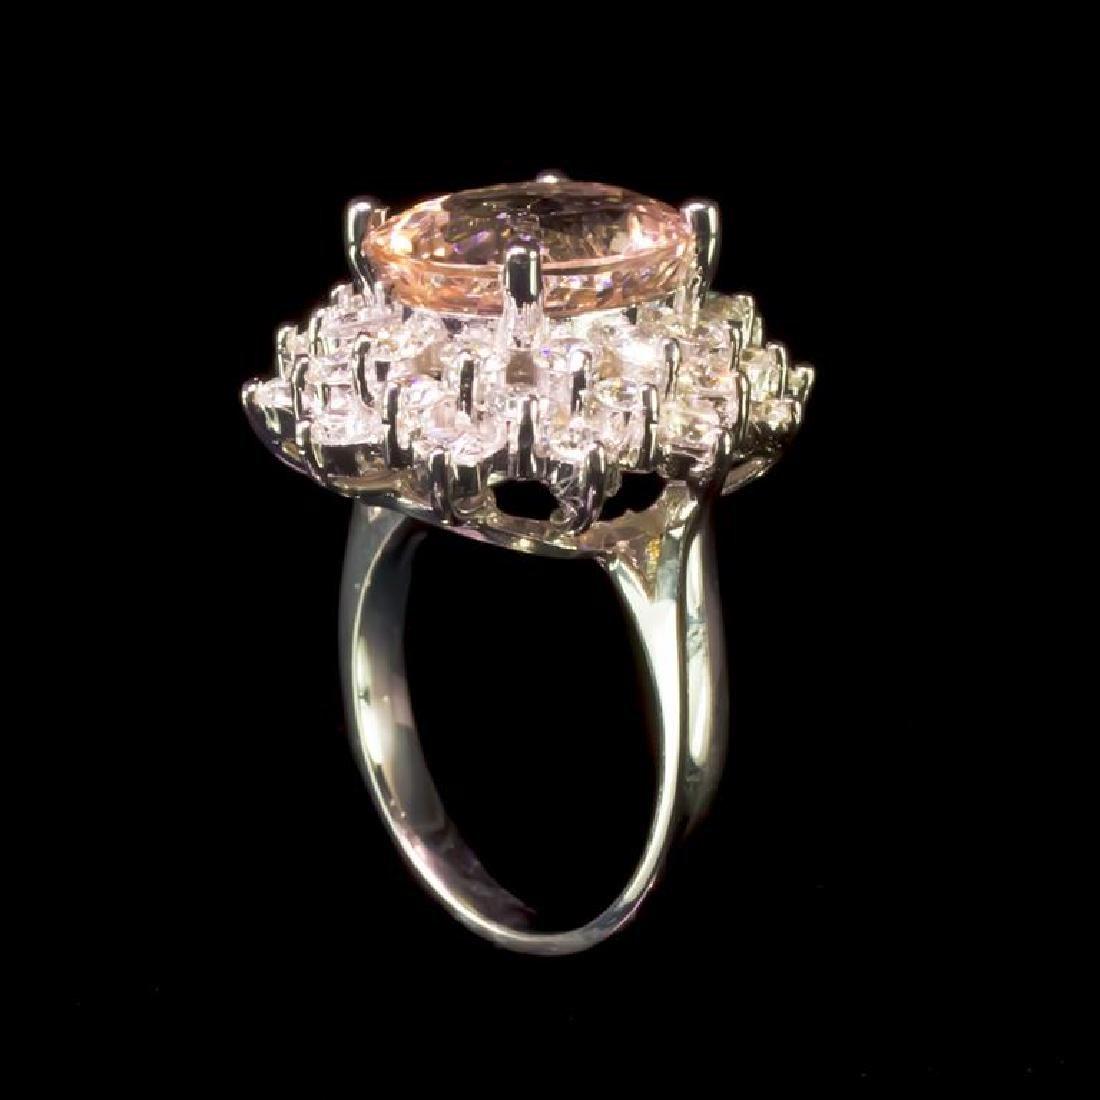 14K Gold 5.14ct Morganite 2.17ct Diamond Ring - 3